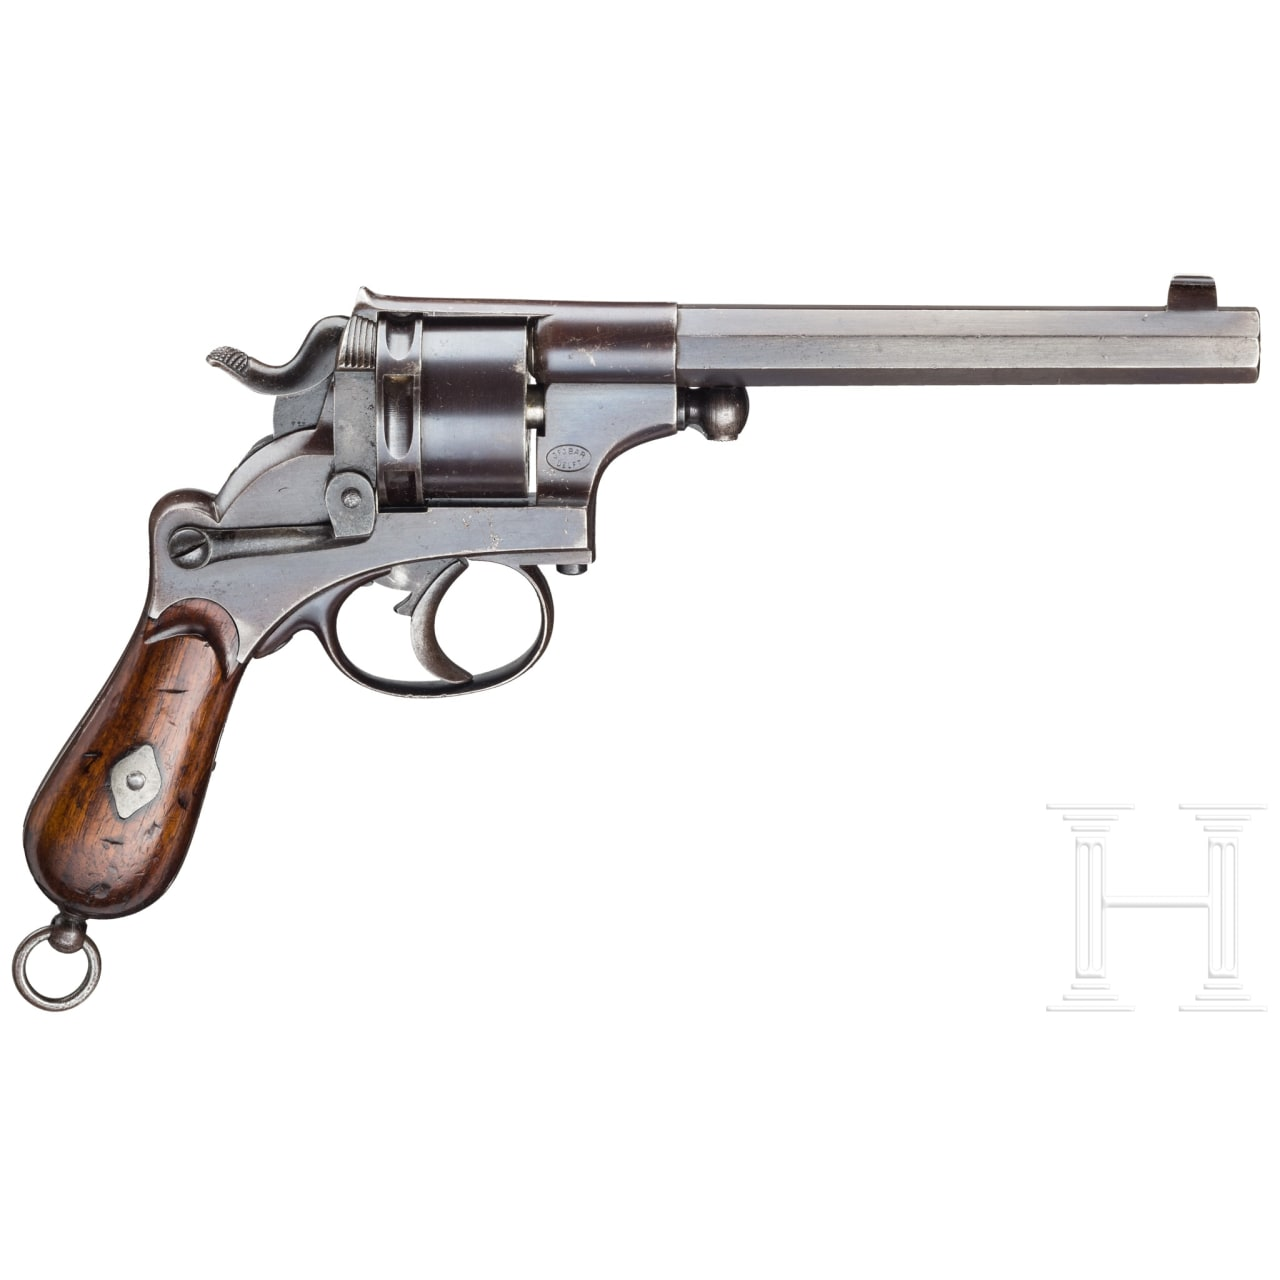 A J.F.J. Bar revolver, Delft (reduced version of Mod. 1873)